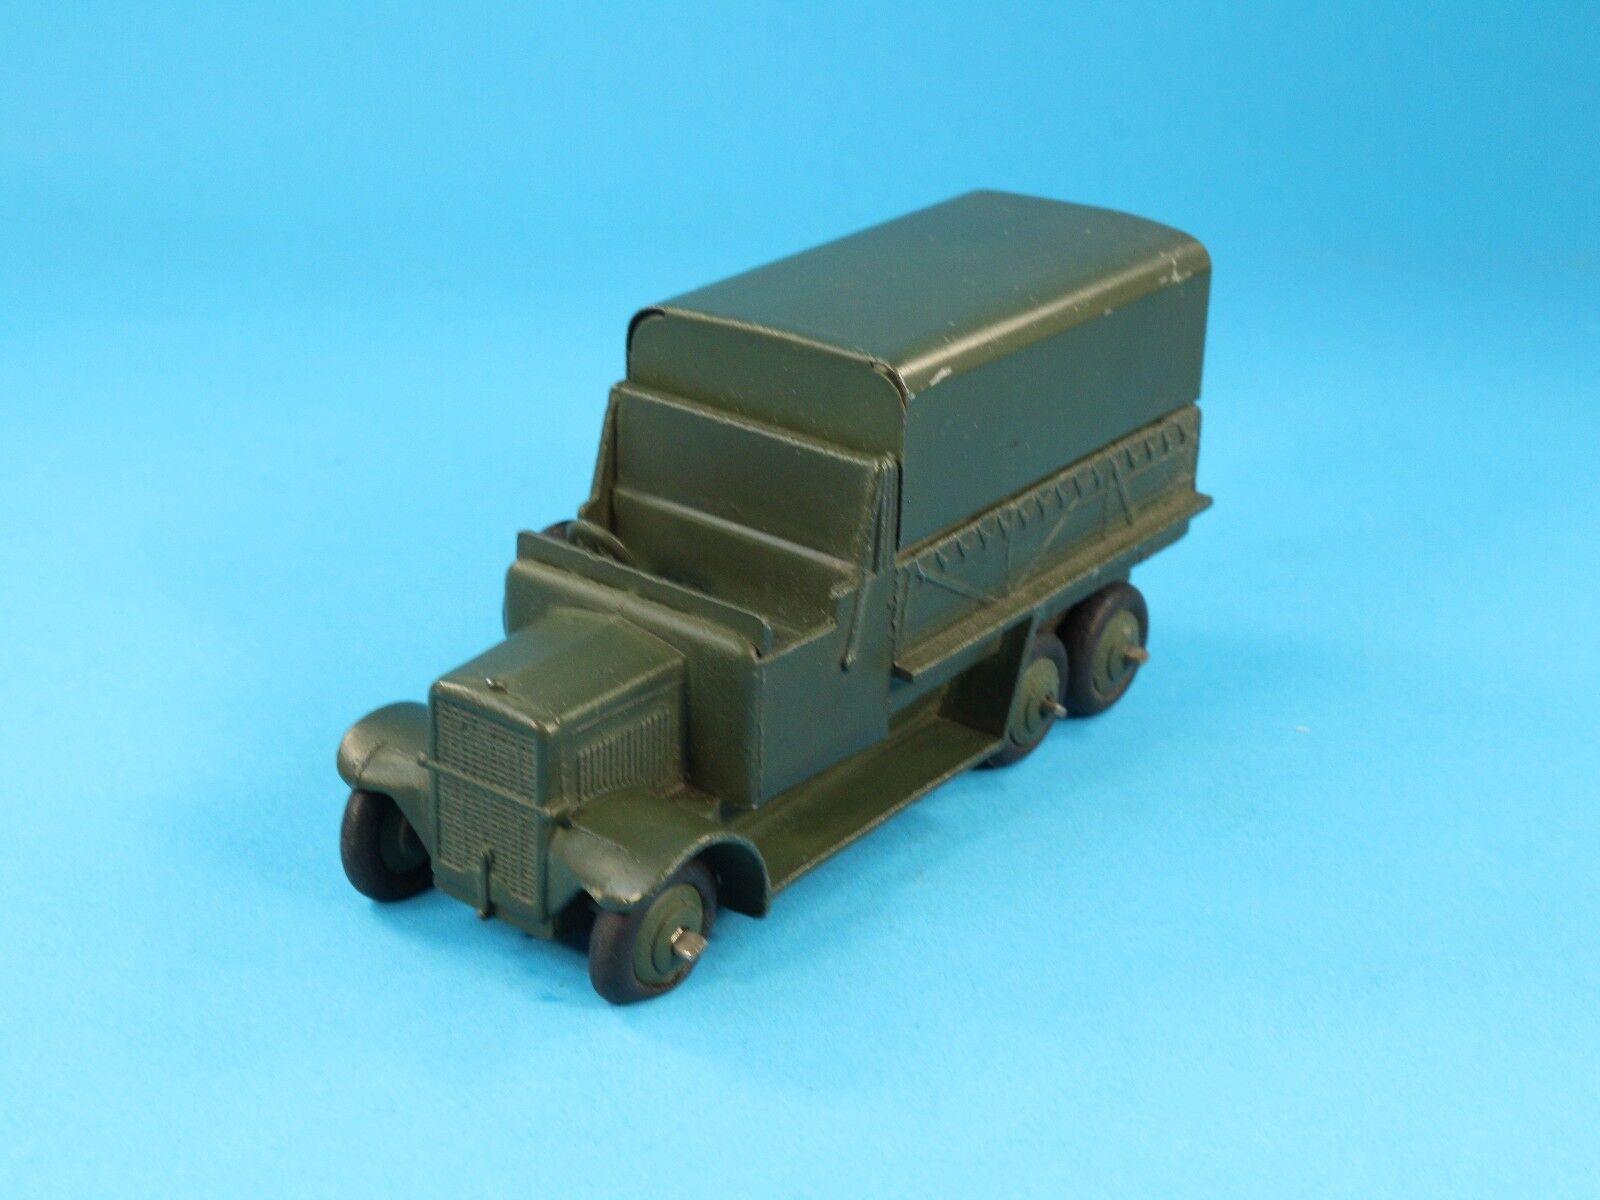 1   43 dinky spielzeug n. 151b carro militare 6 ruote coperto - 1947   49 [ov3-28]